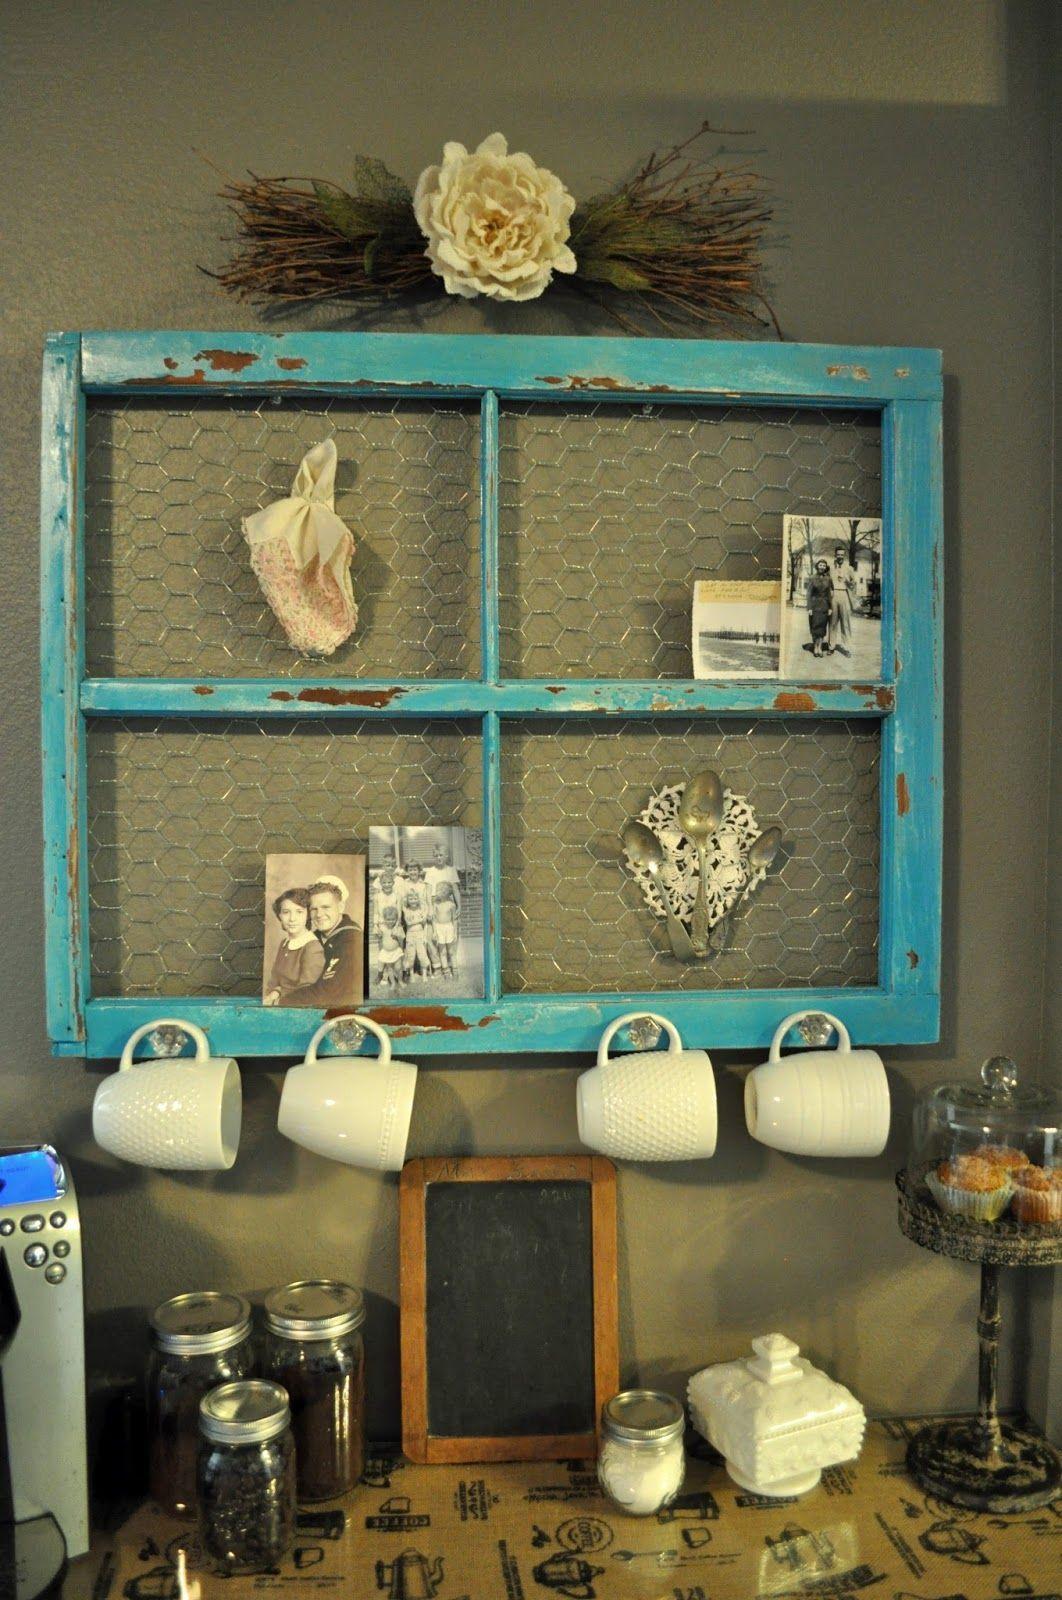 The Best Repurposed Old Inside Trendy Old Rustic Barn Window Frame (View 16 of 20)